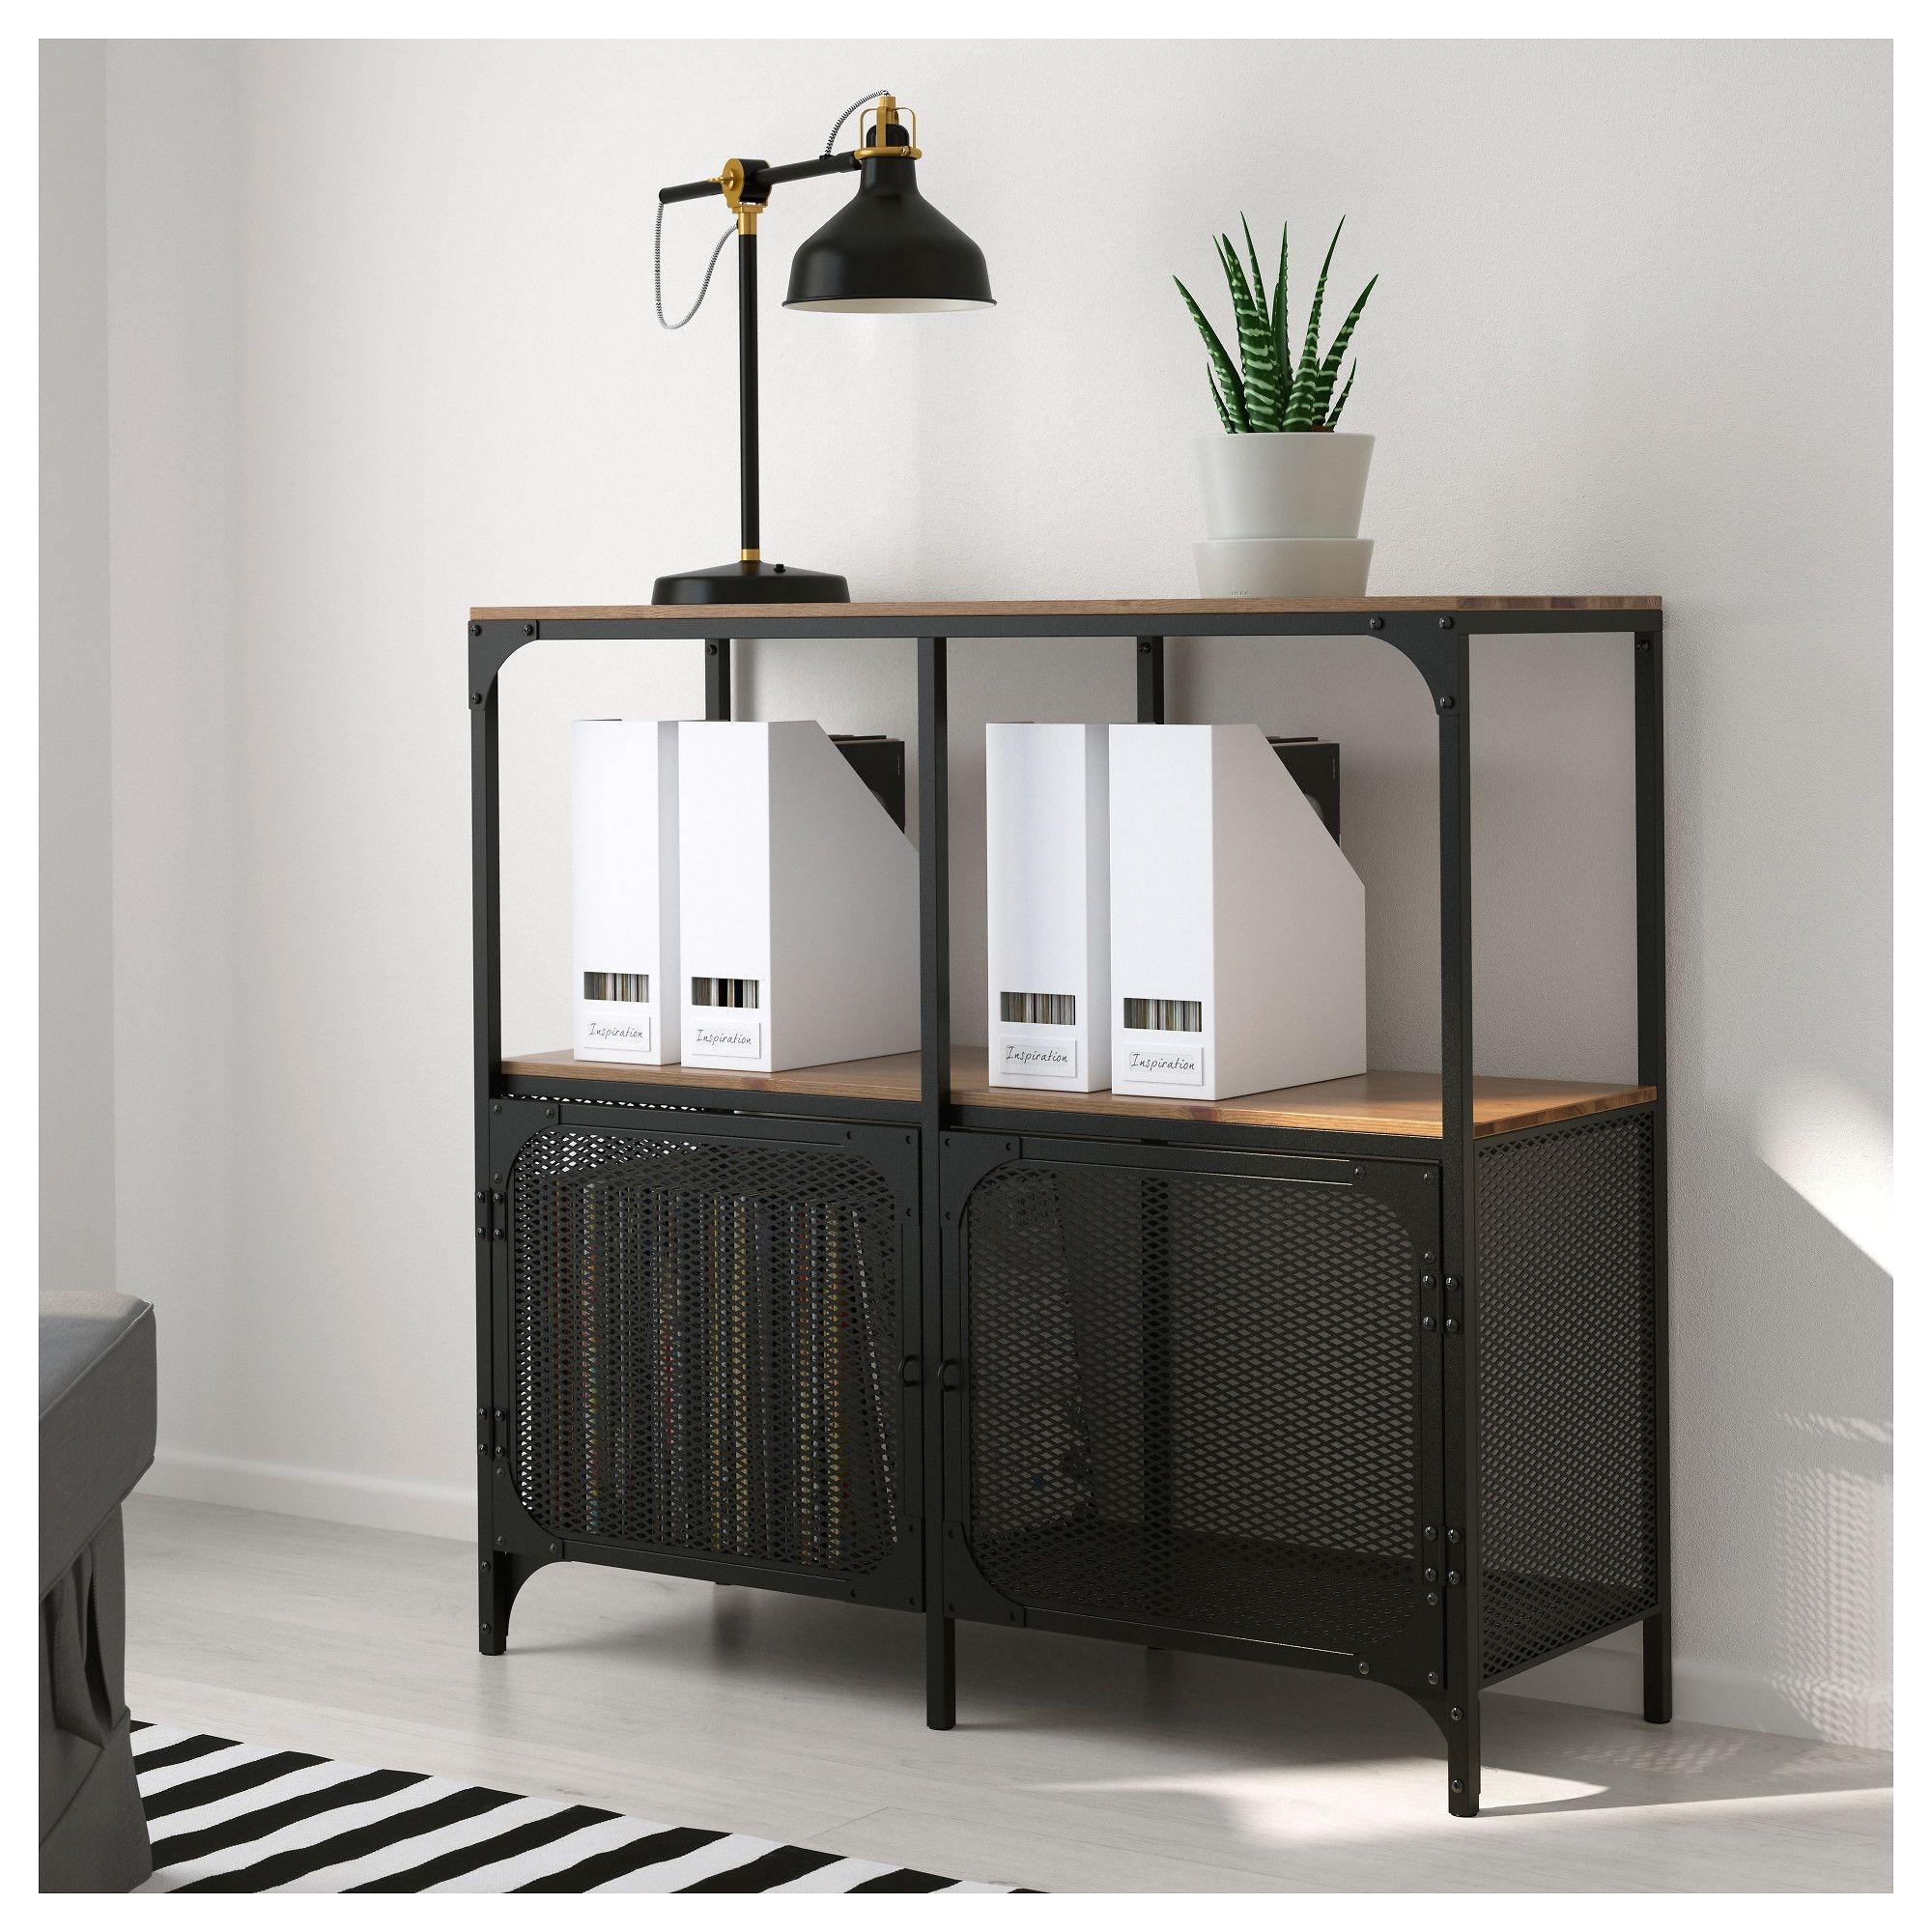 Bakers Rack Ikea Canada Ikea Fja Llbo Shelf Unit Black Pinterest Shelves Living Rooms